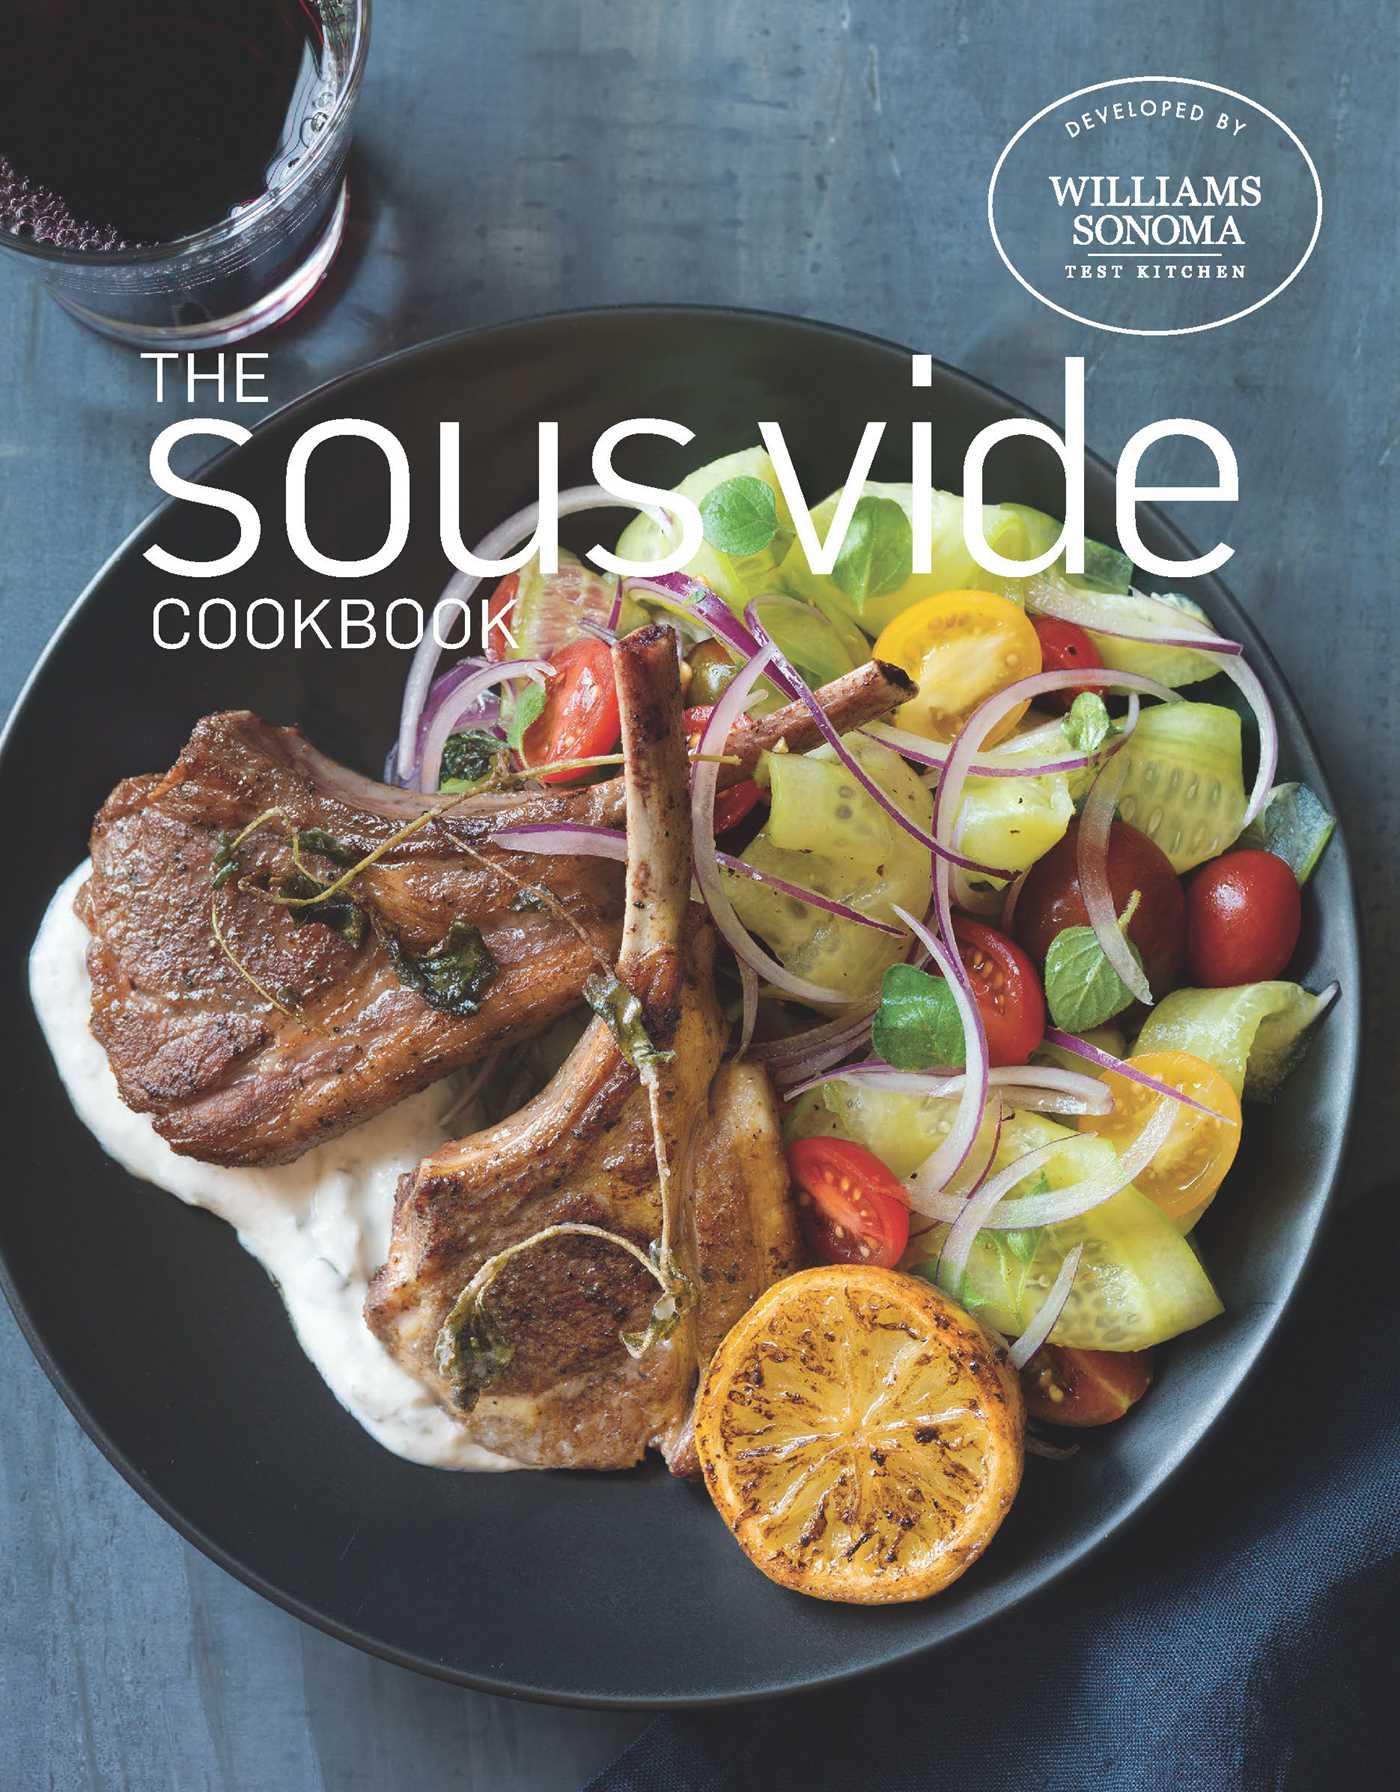 The sous vide cookbook 9781681883984 hr